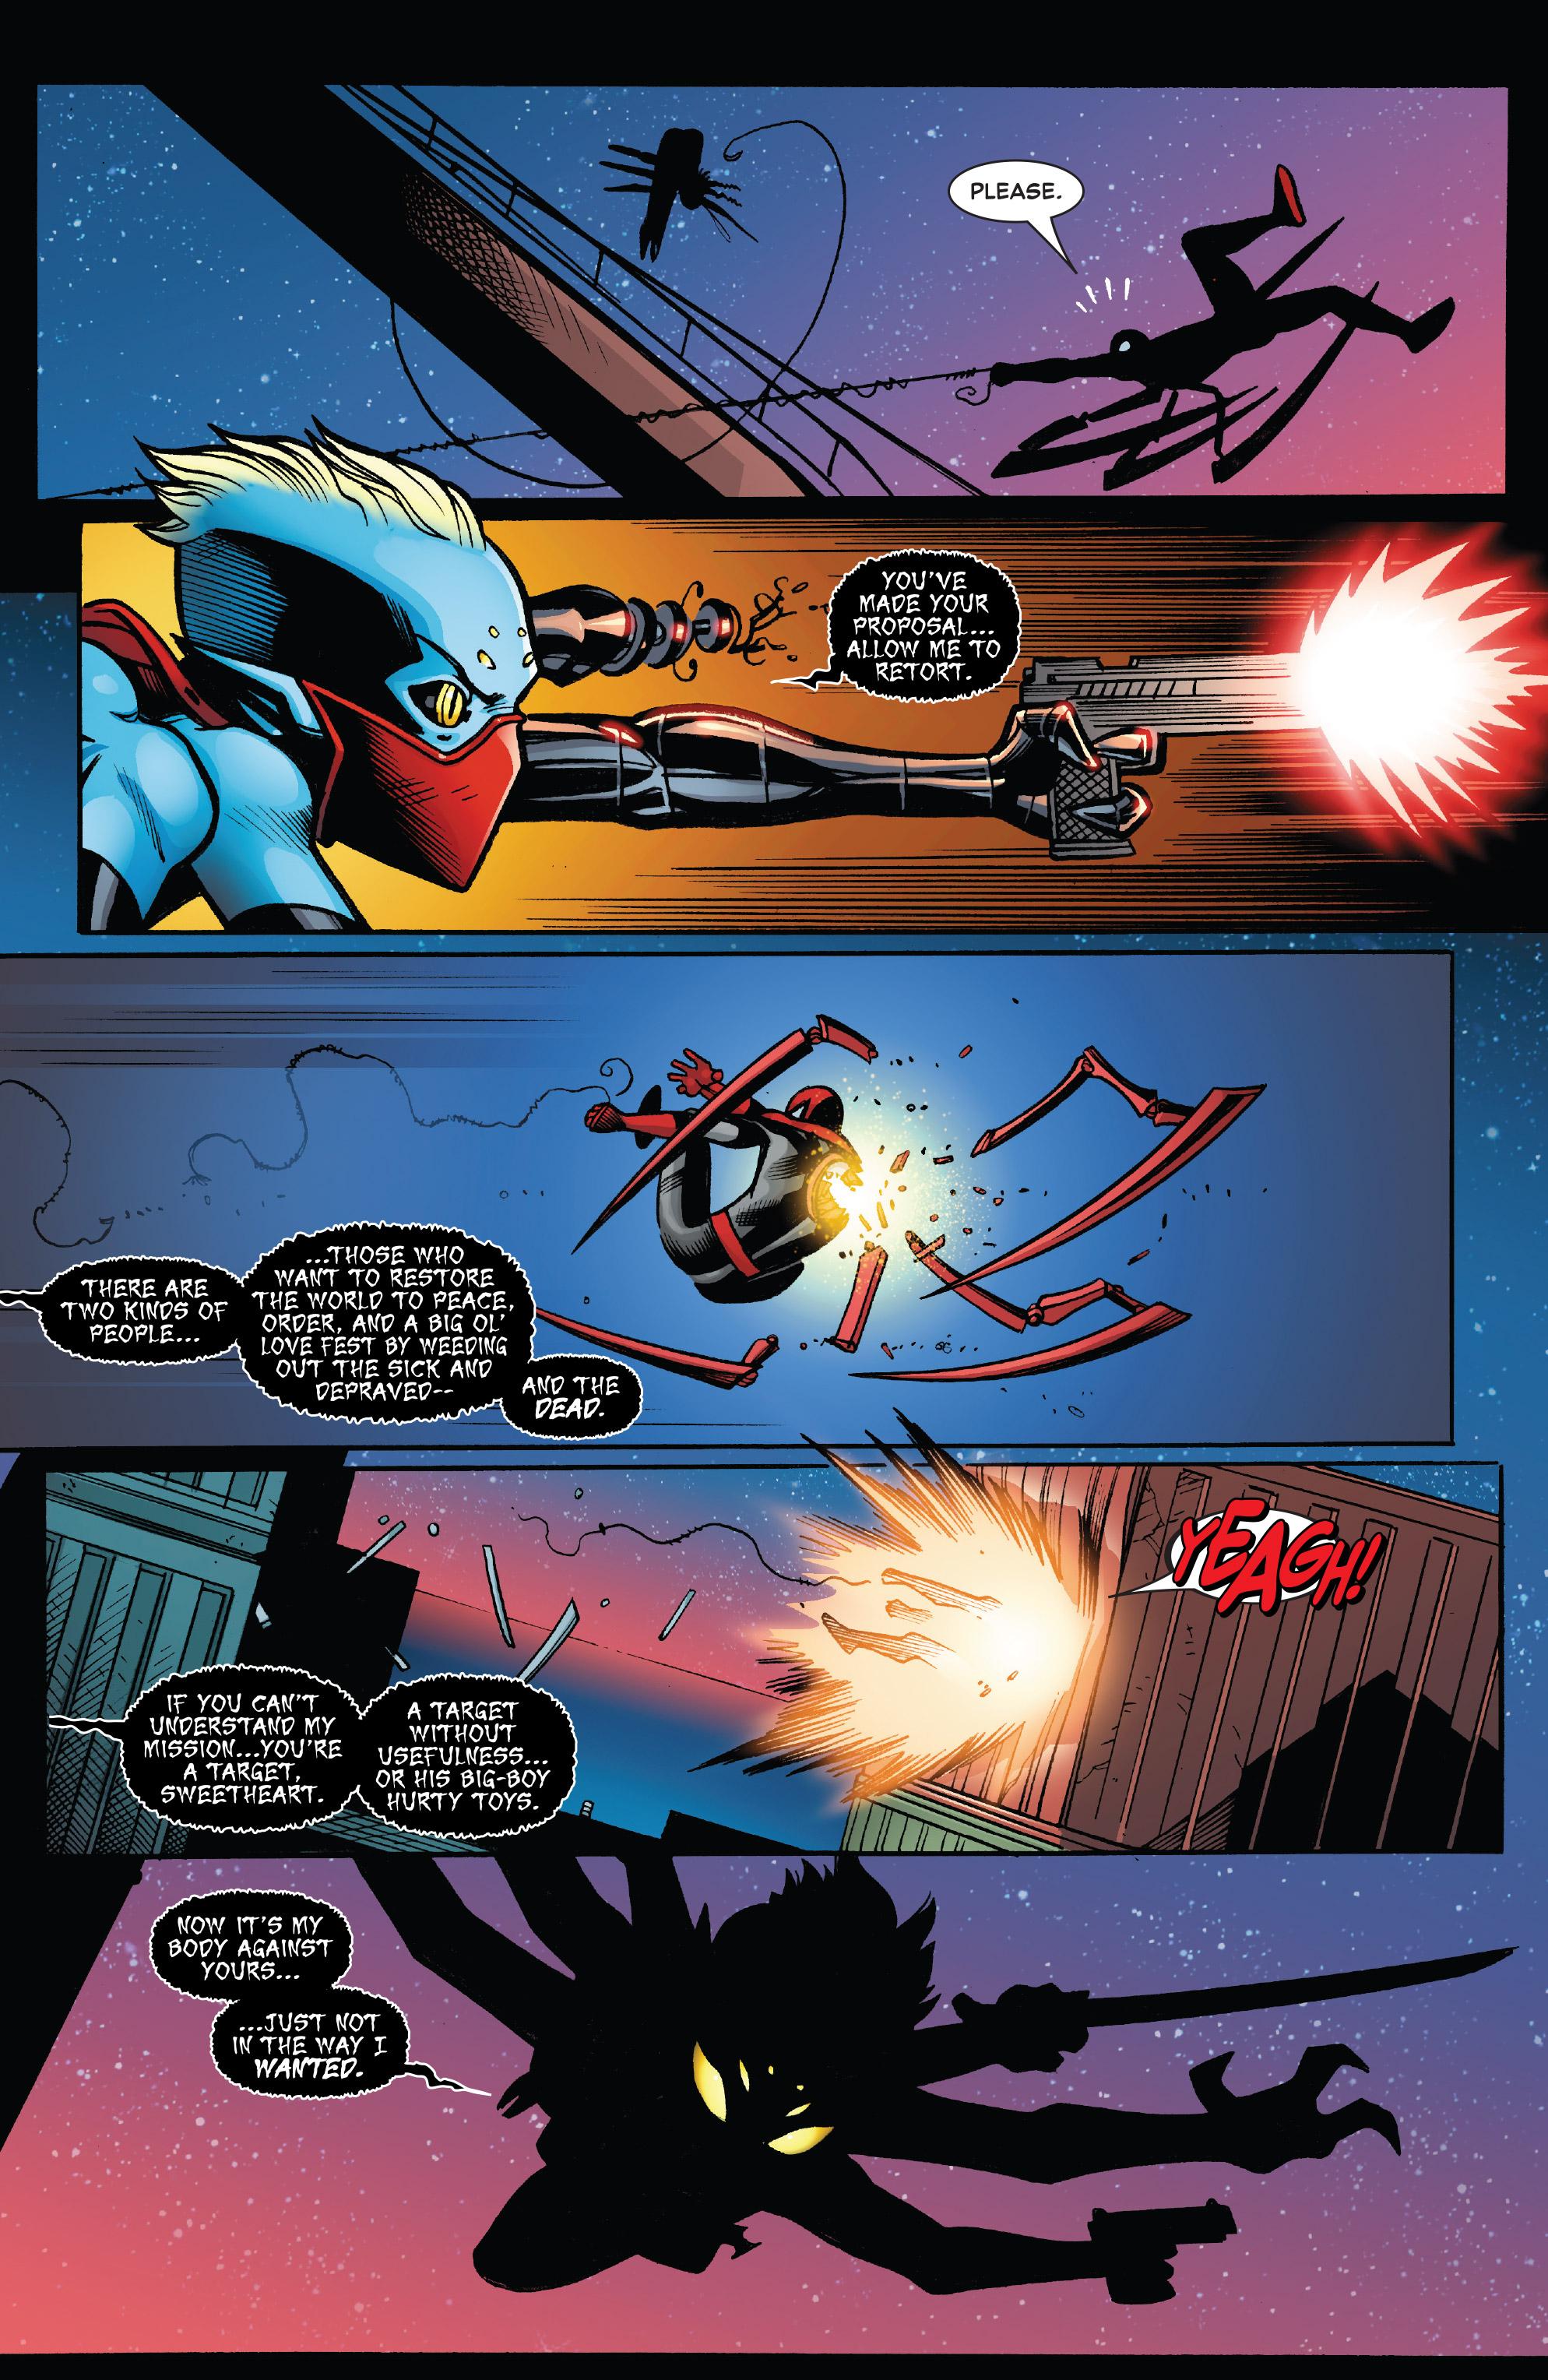 Read online Spider-Man/Deadpool comic -  Issue #17 - 12